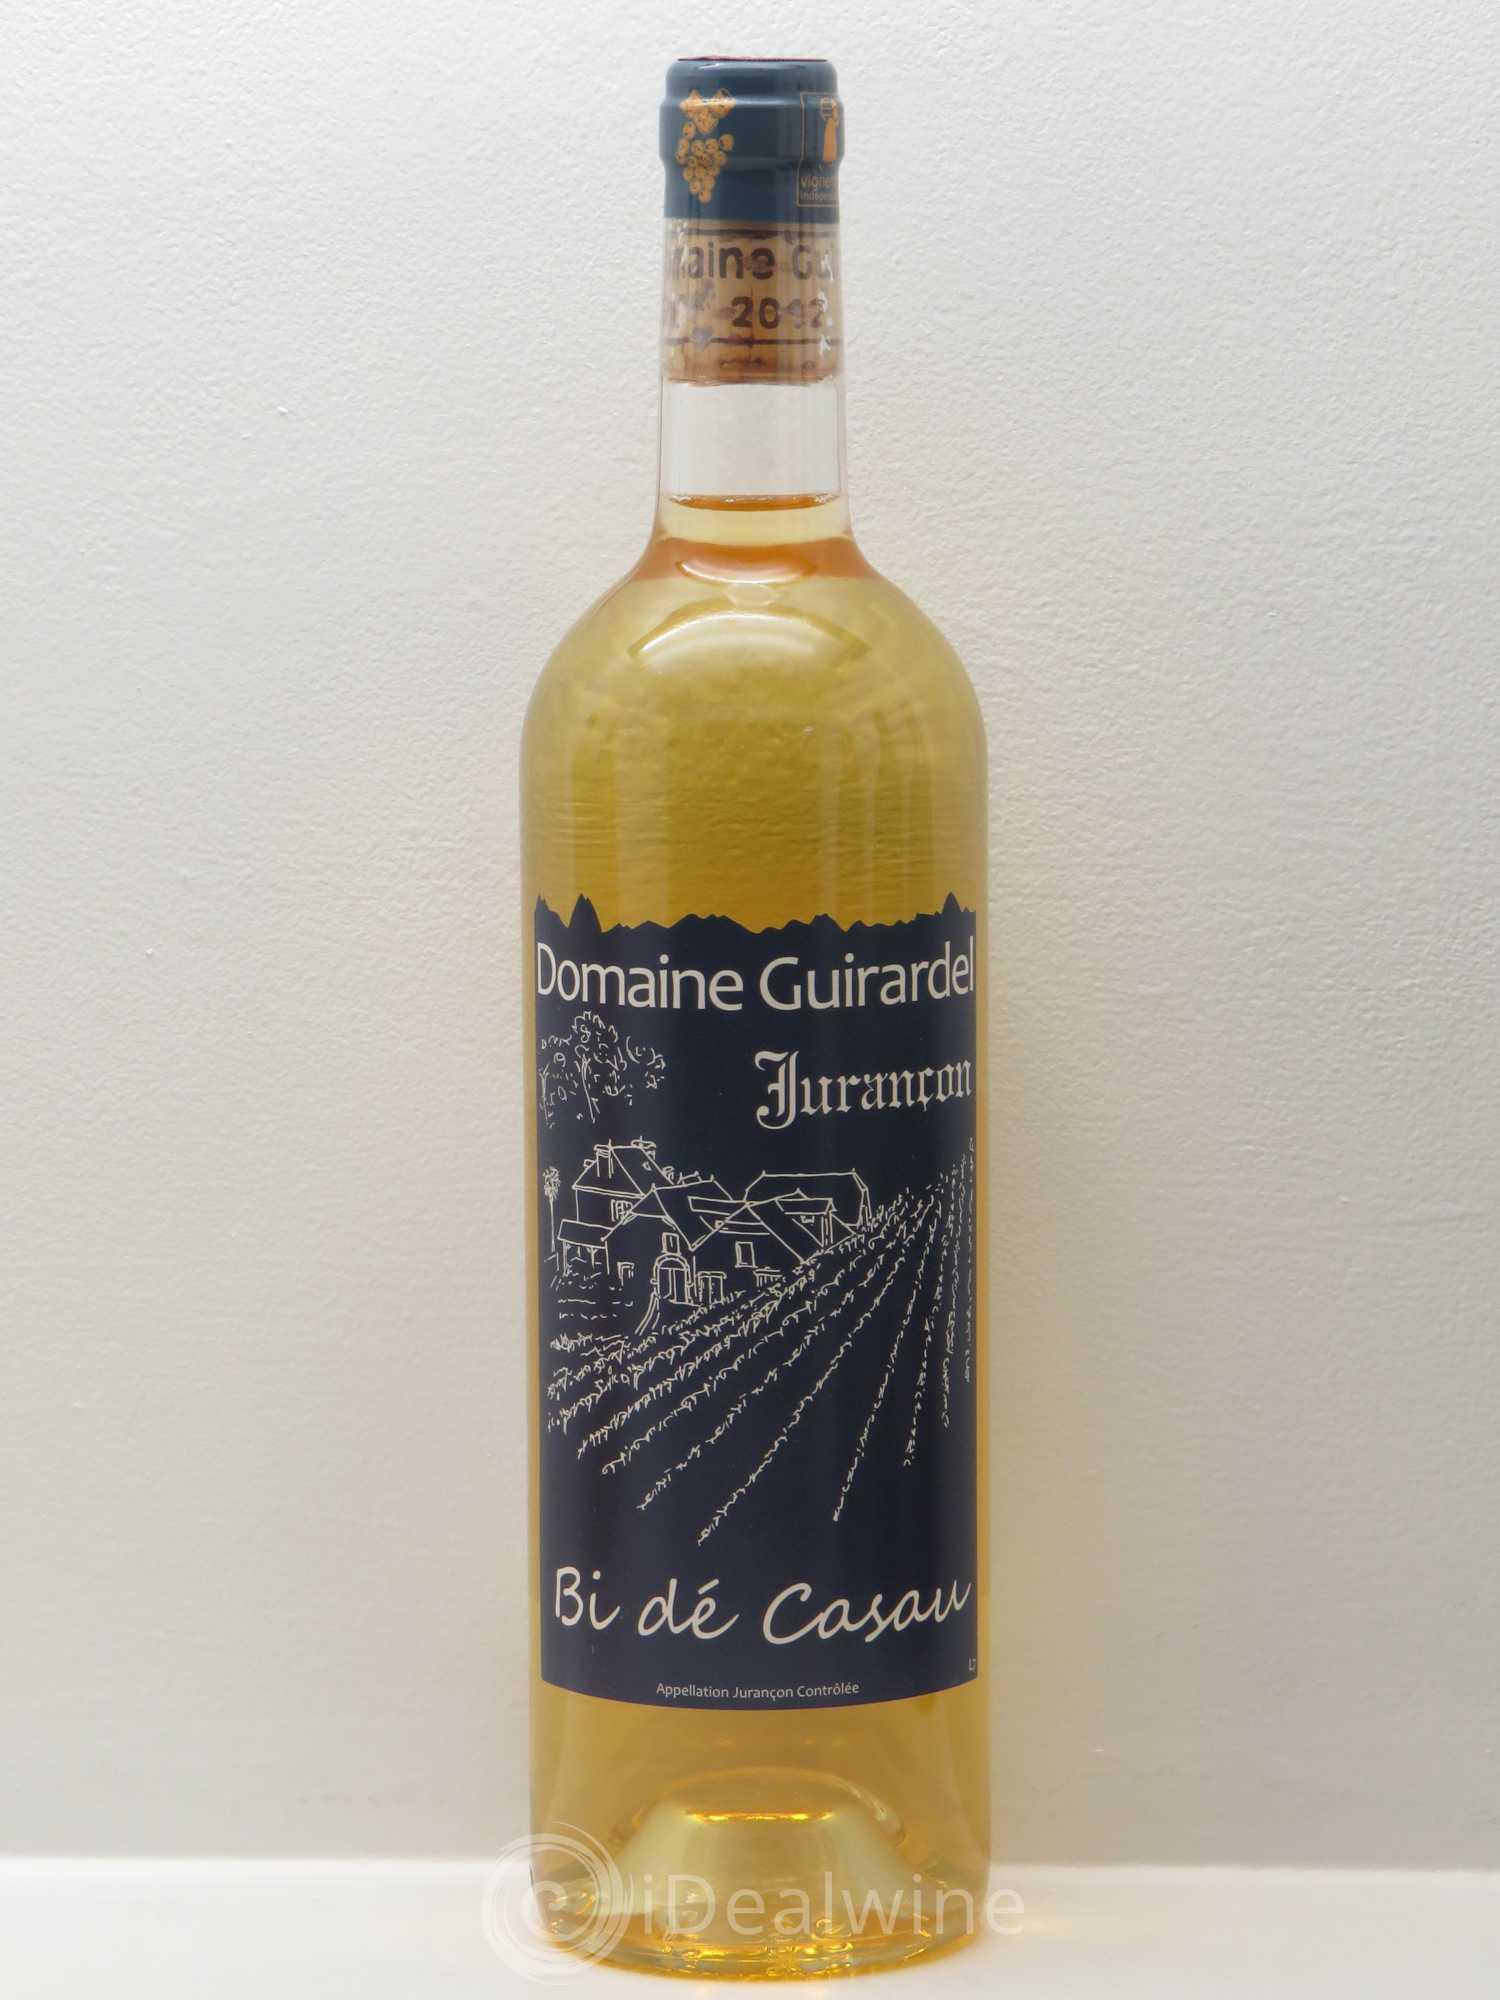 Liste des vins de juran on en vente idealwine for Jardin de babylone wine